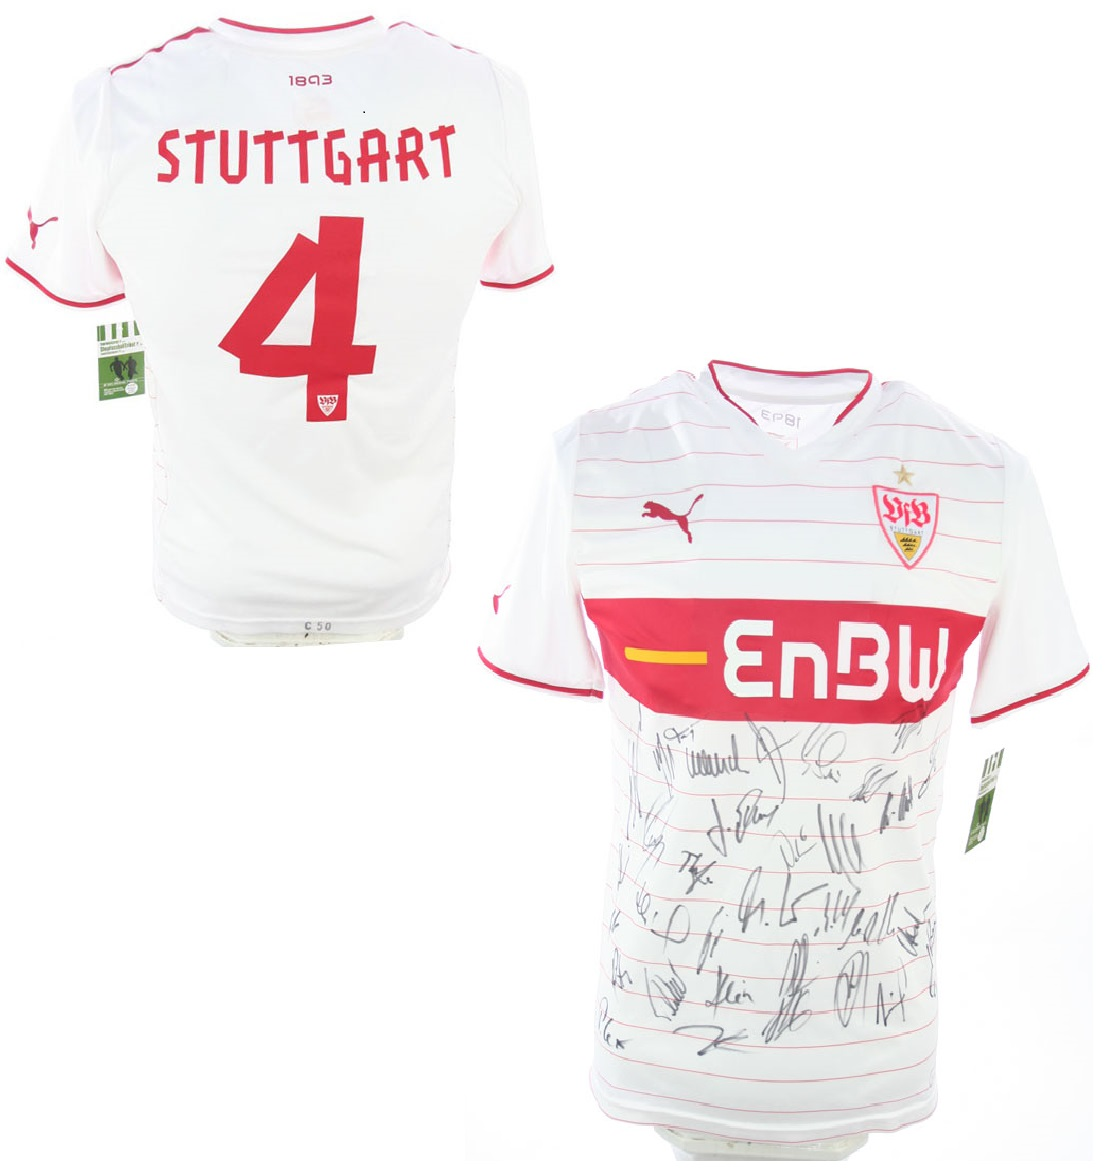 Puma VfB Stuttgart Trikot 200910 vom TeamKader Hand